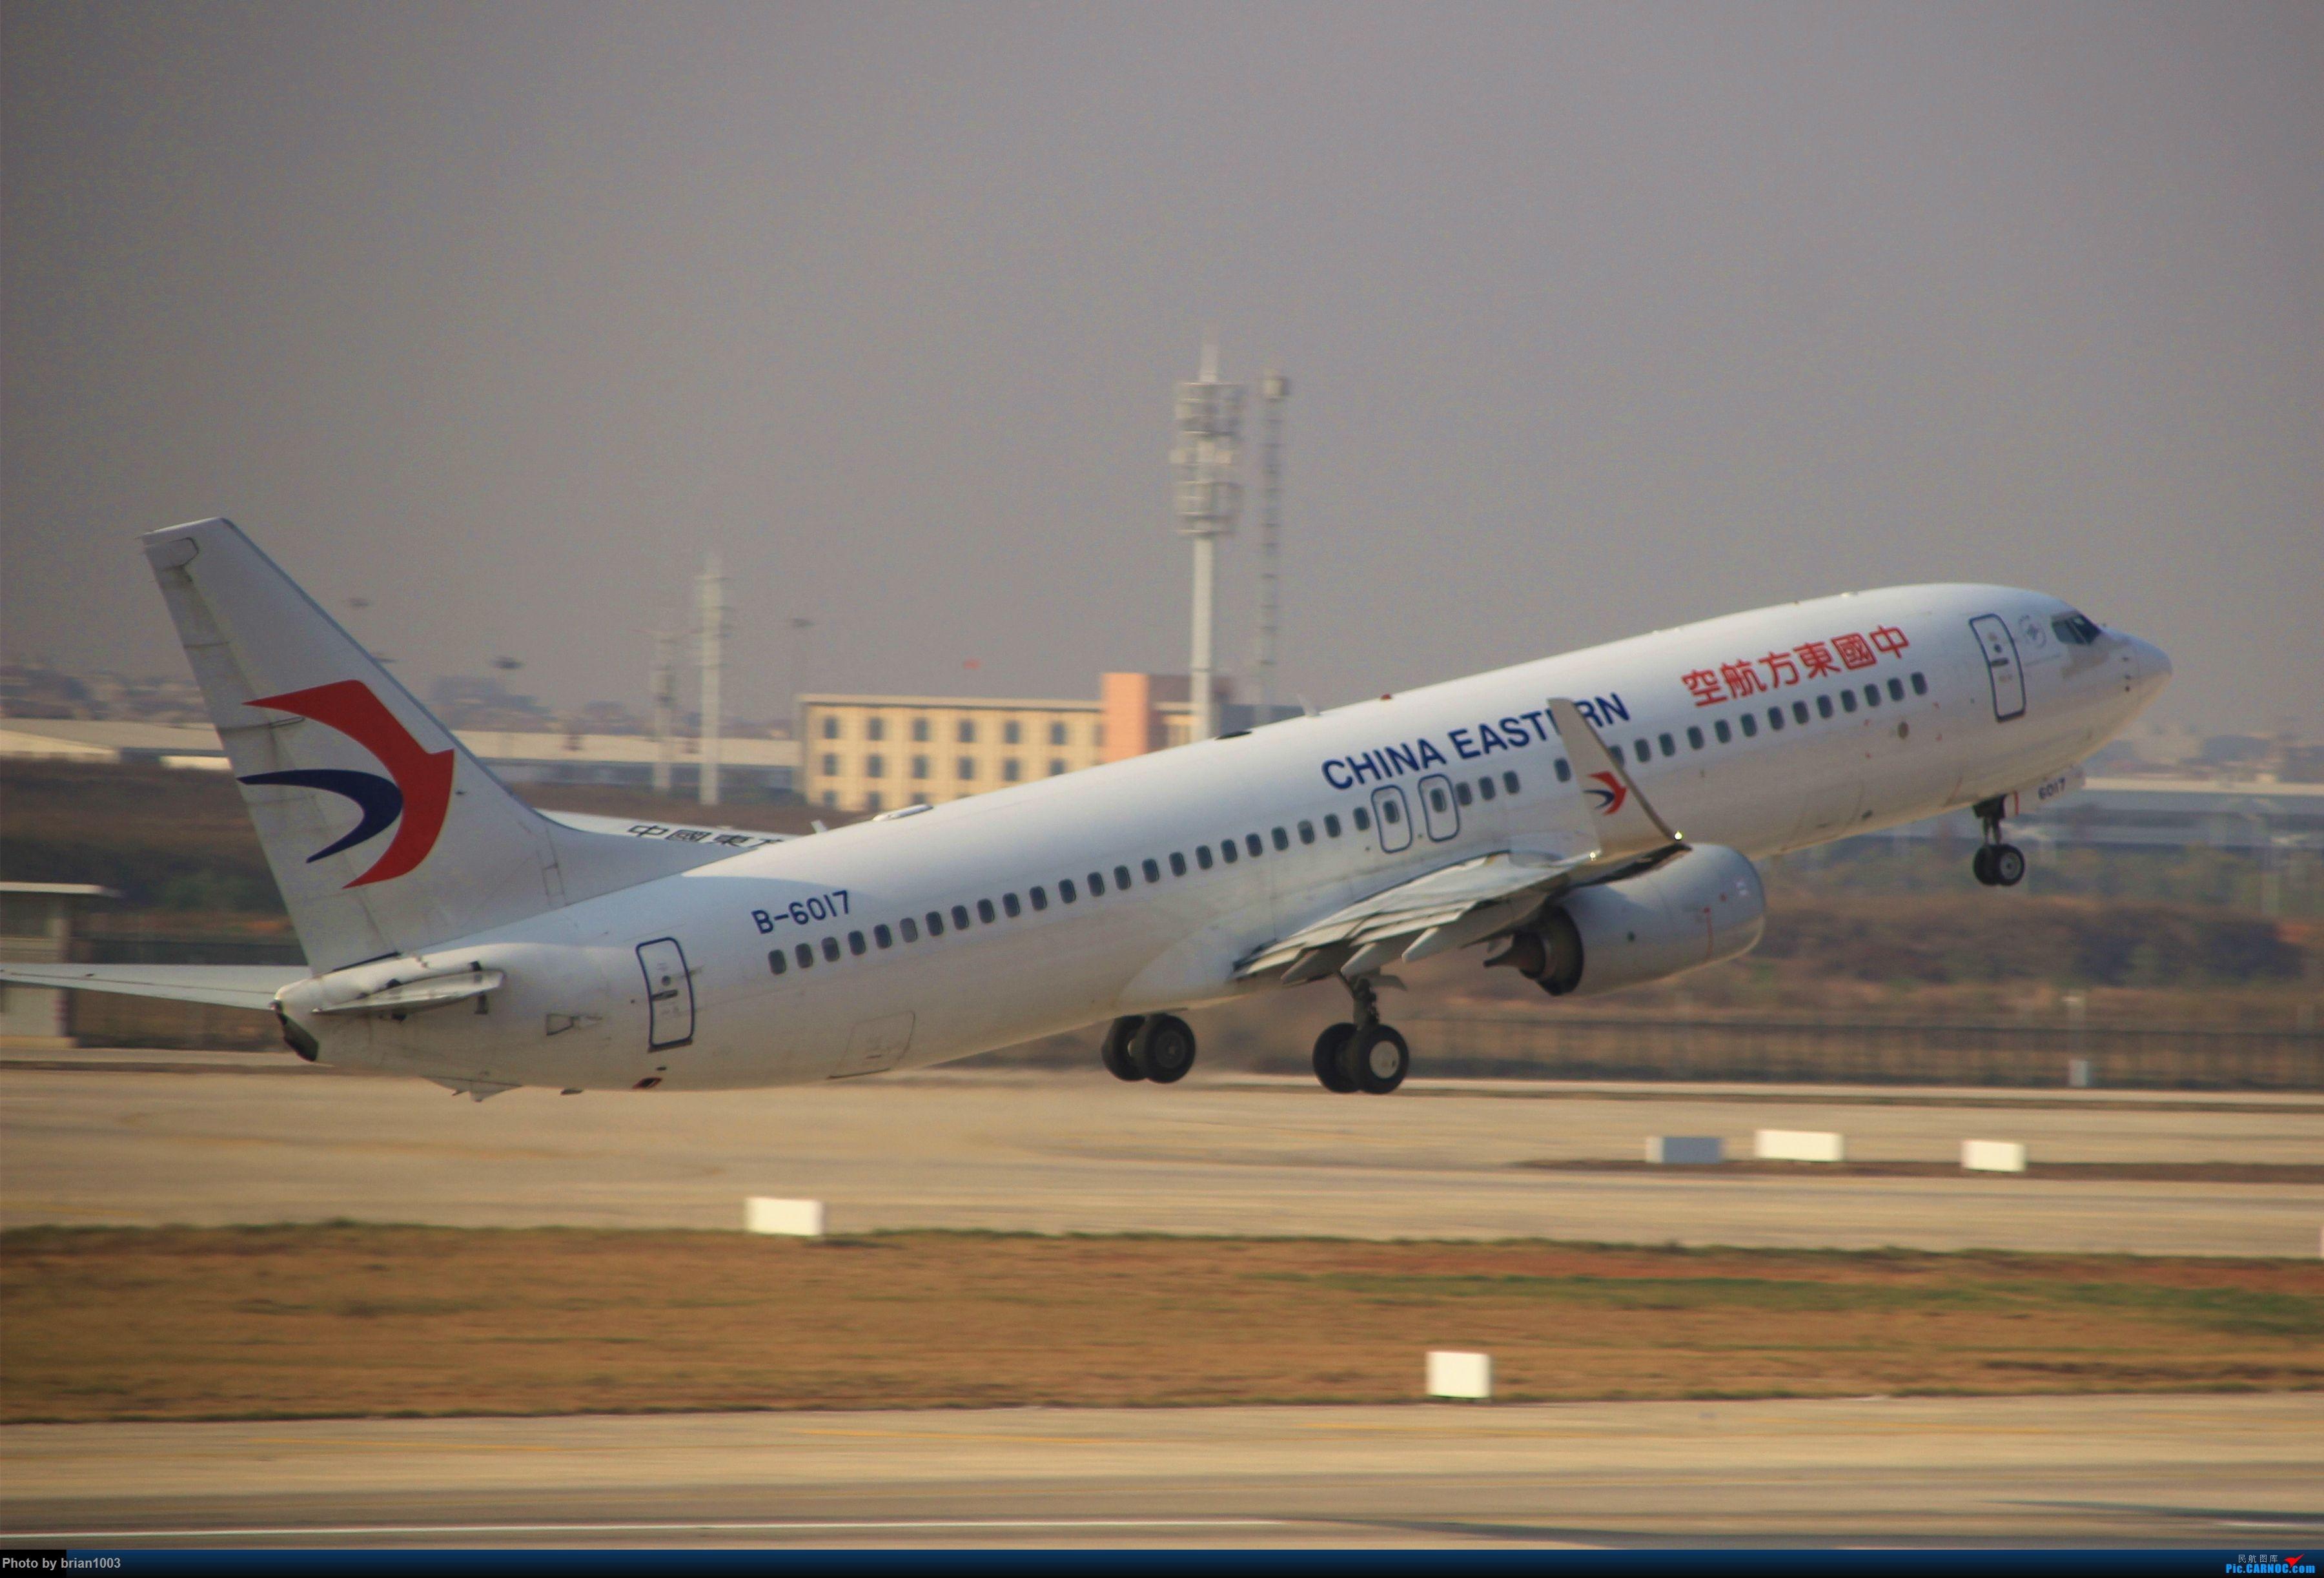 Re:[原创]WUH武汉天河机场拍机之新航季来的海航333和幸福的738 BOEING 737-800 B-6017 中国武汉天河国际机场